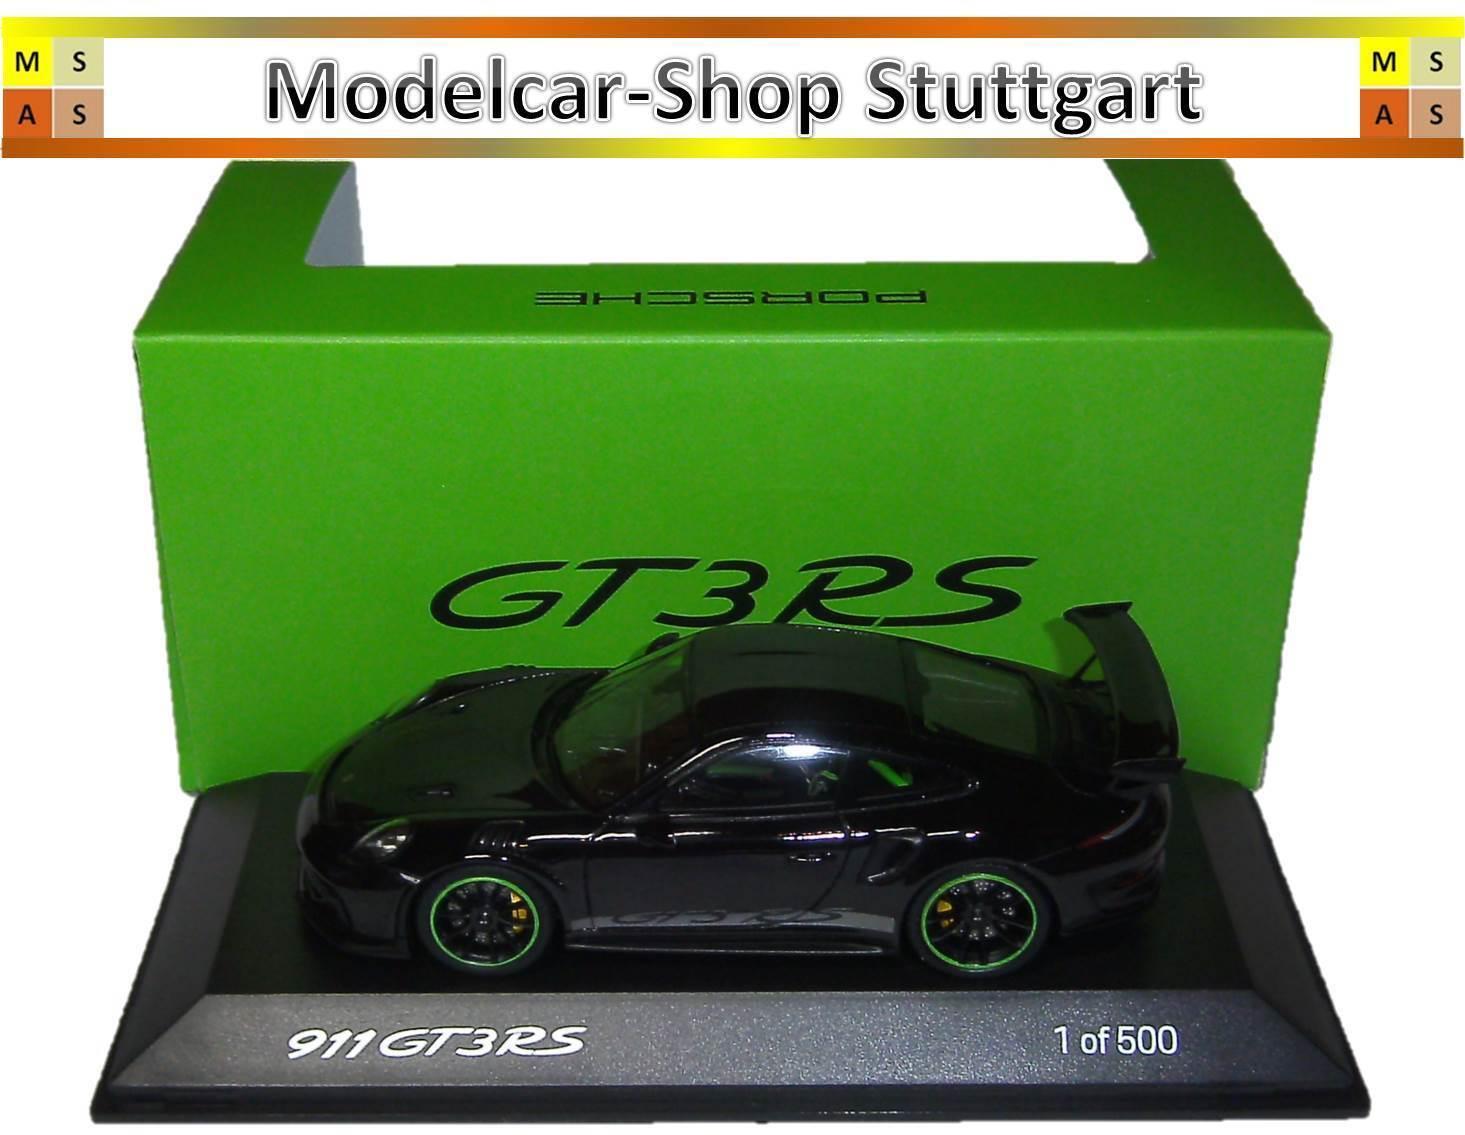 Porsche 911 GT3 Rs Noir Édition Limitée 500 Spark 1 43 - WAX02020083 Neuf